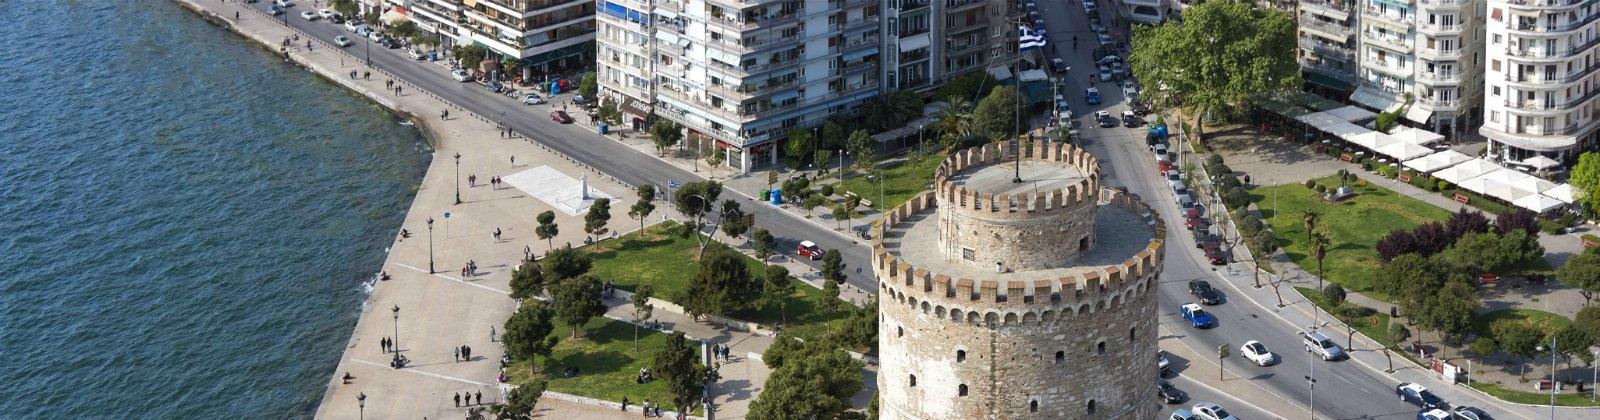 Thessaloniki's Coastline family friendly walking tours kids love greece